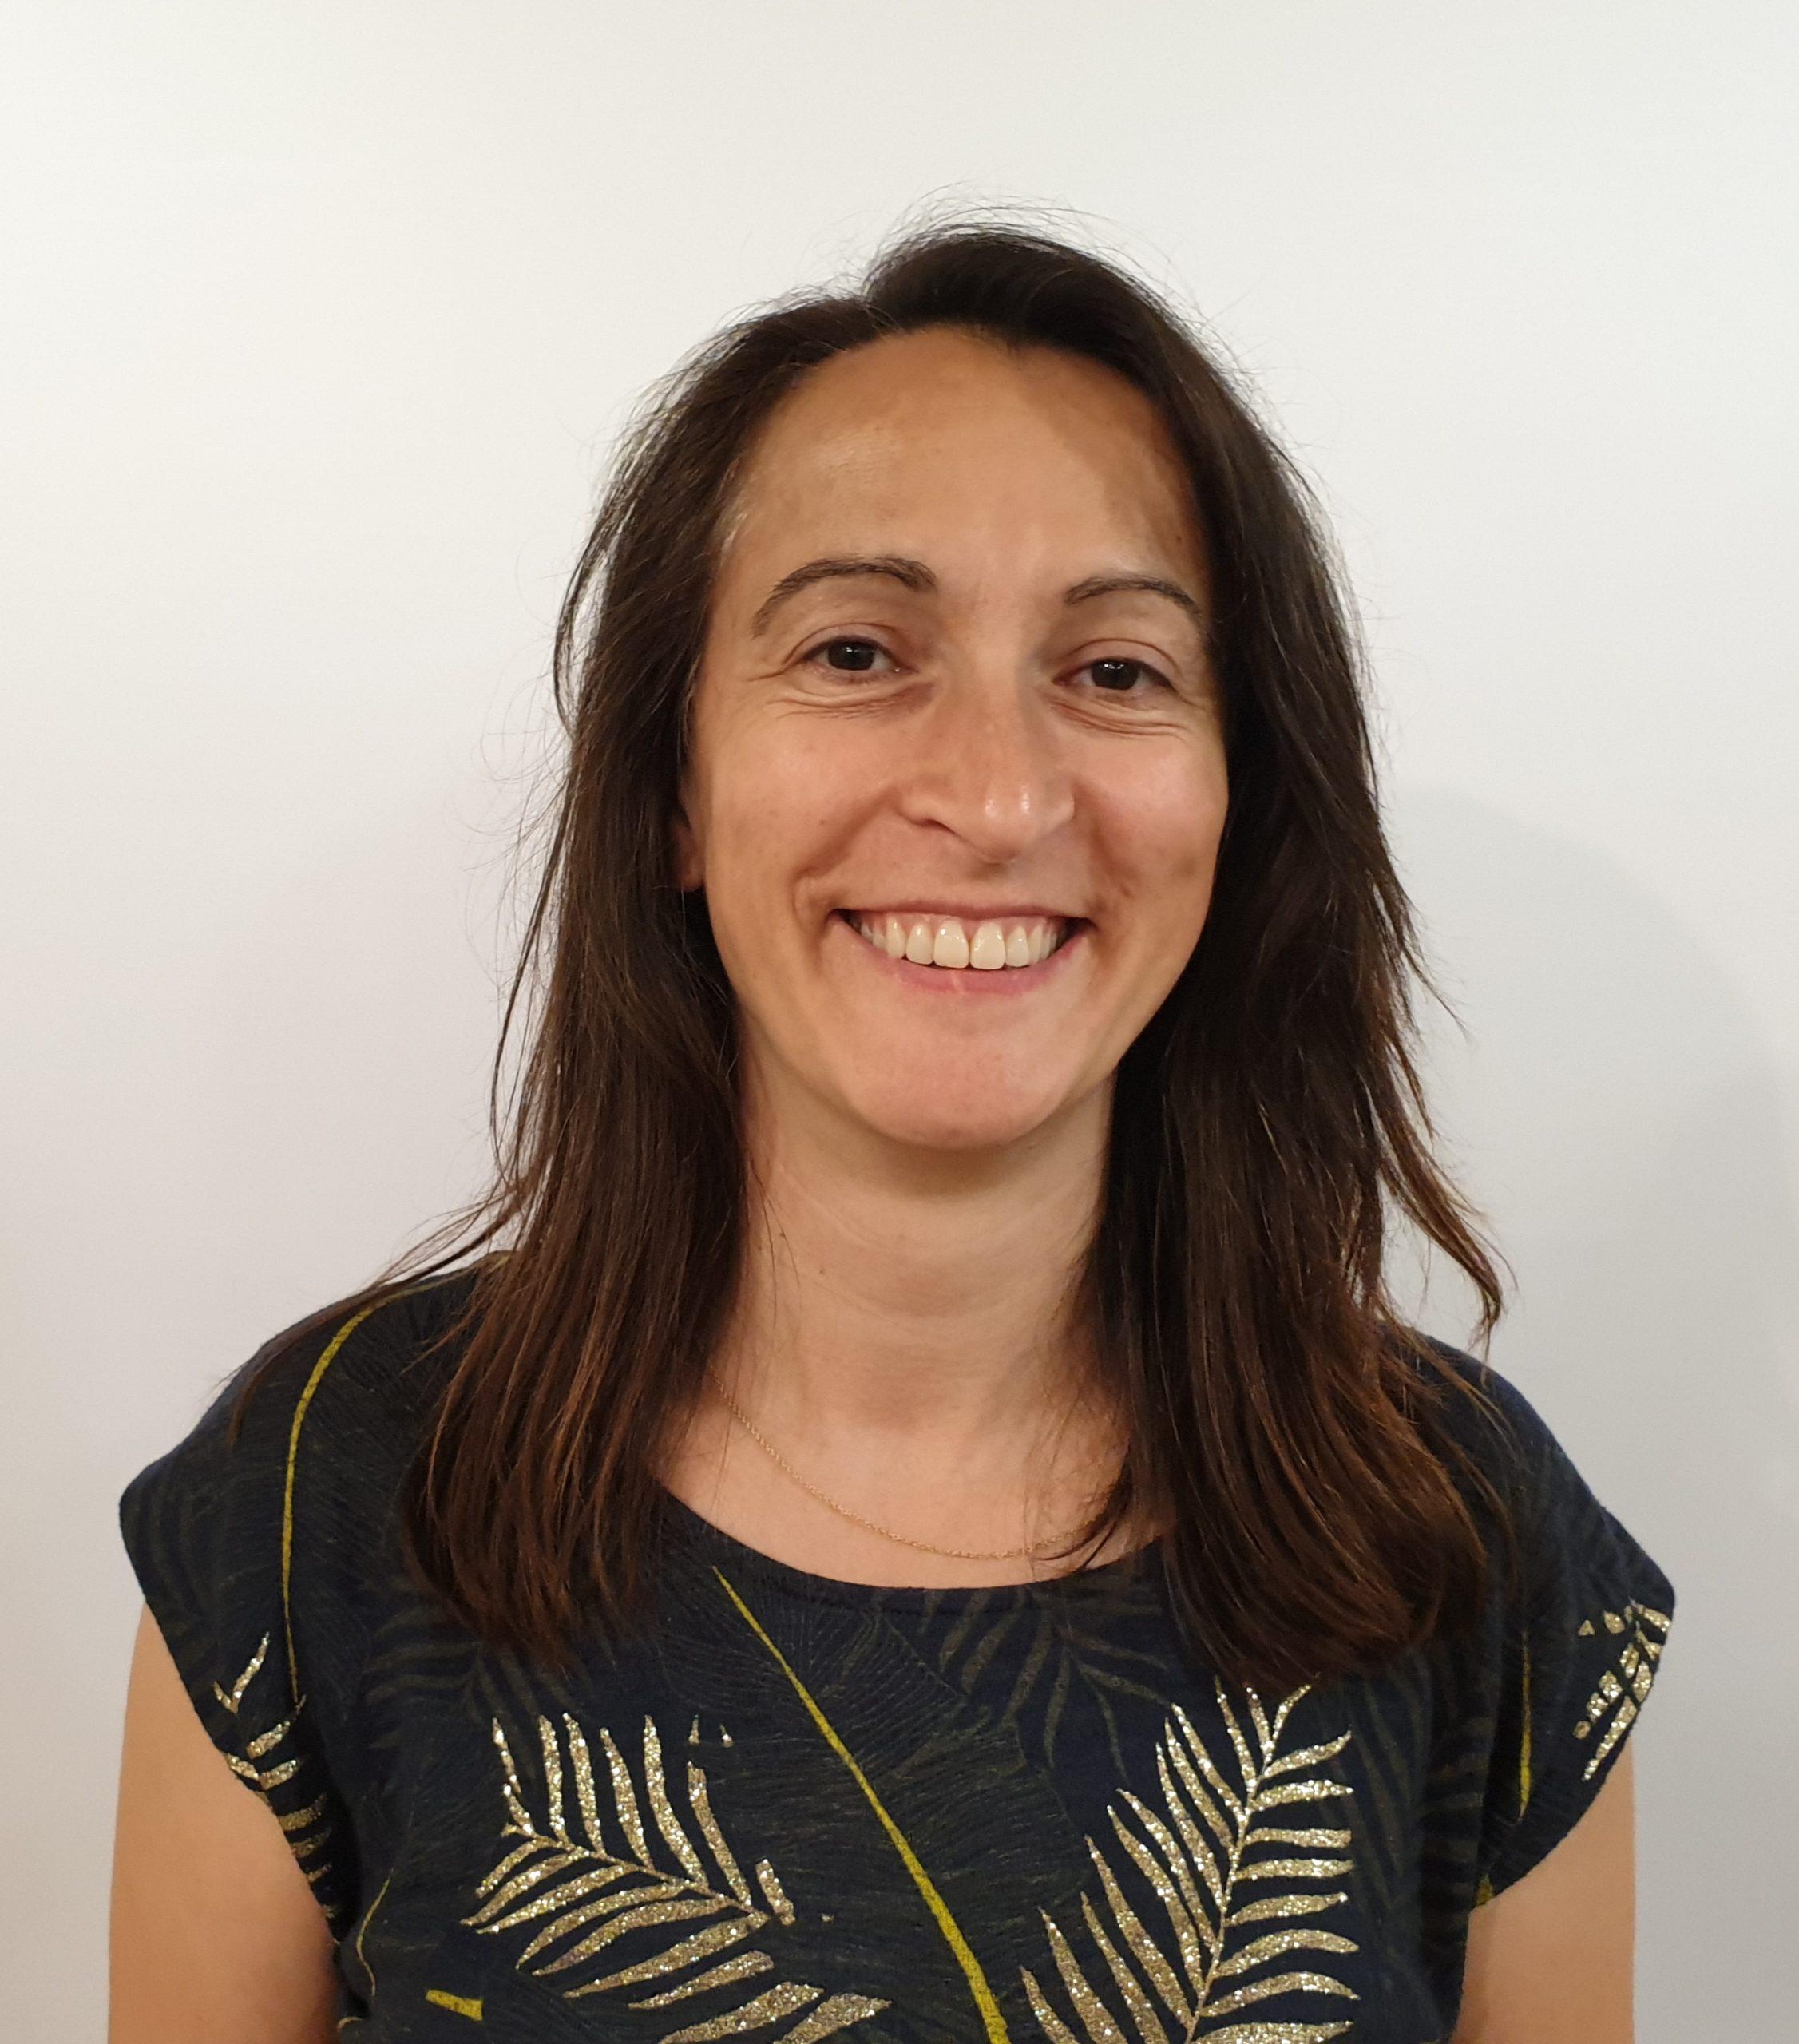 4ème Adjointe : Anita RIGAUDEAU